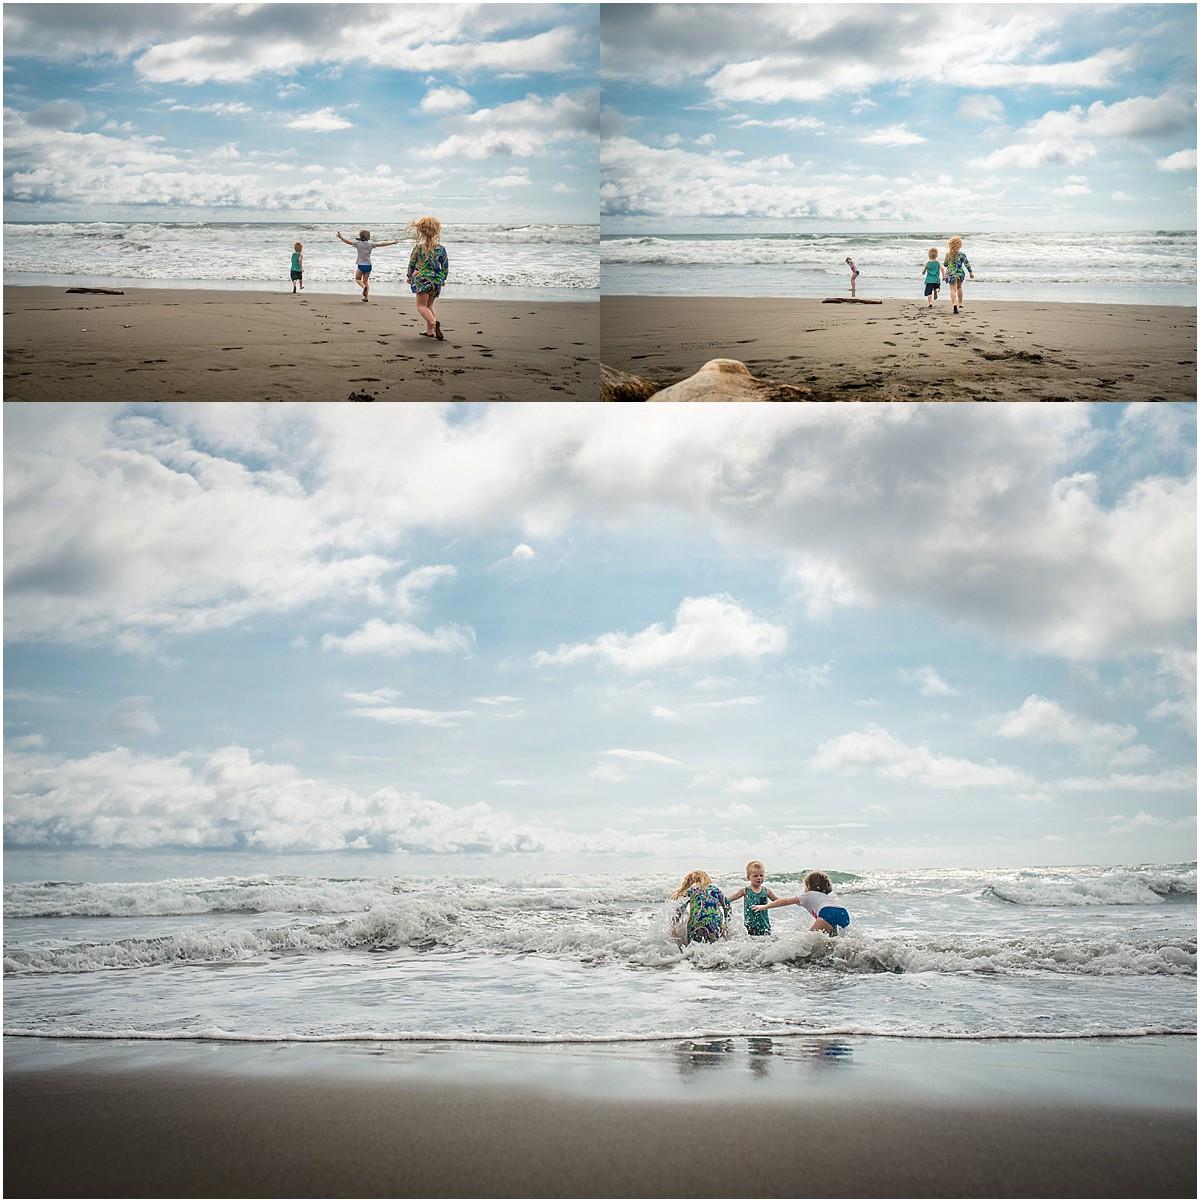 Ashley_Rogers_Photography_South_Florida_Photographer_Orlando_Photographer_Costa_Rica_Photographer_1639.jpg